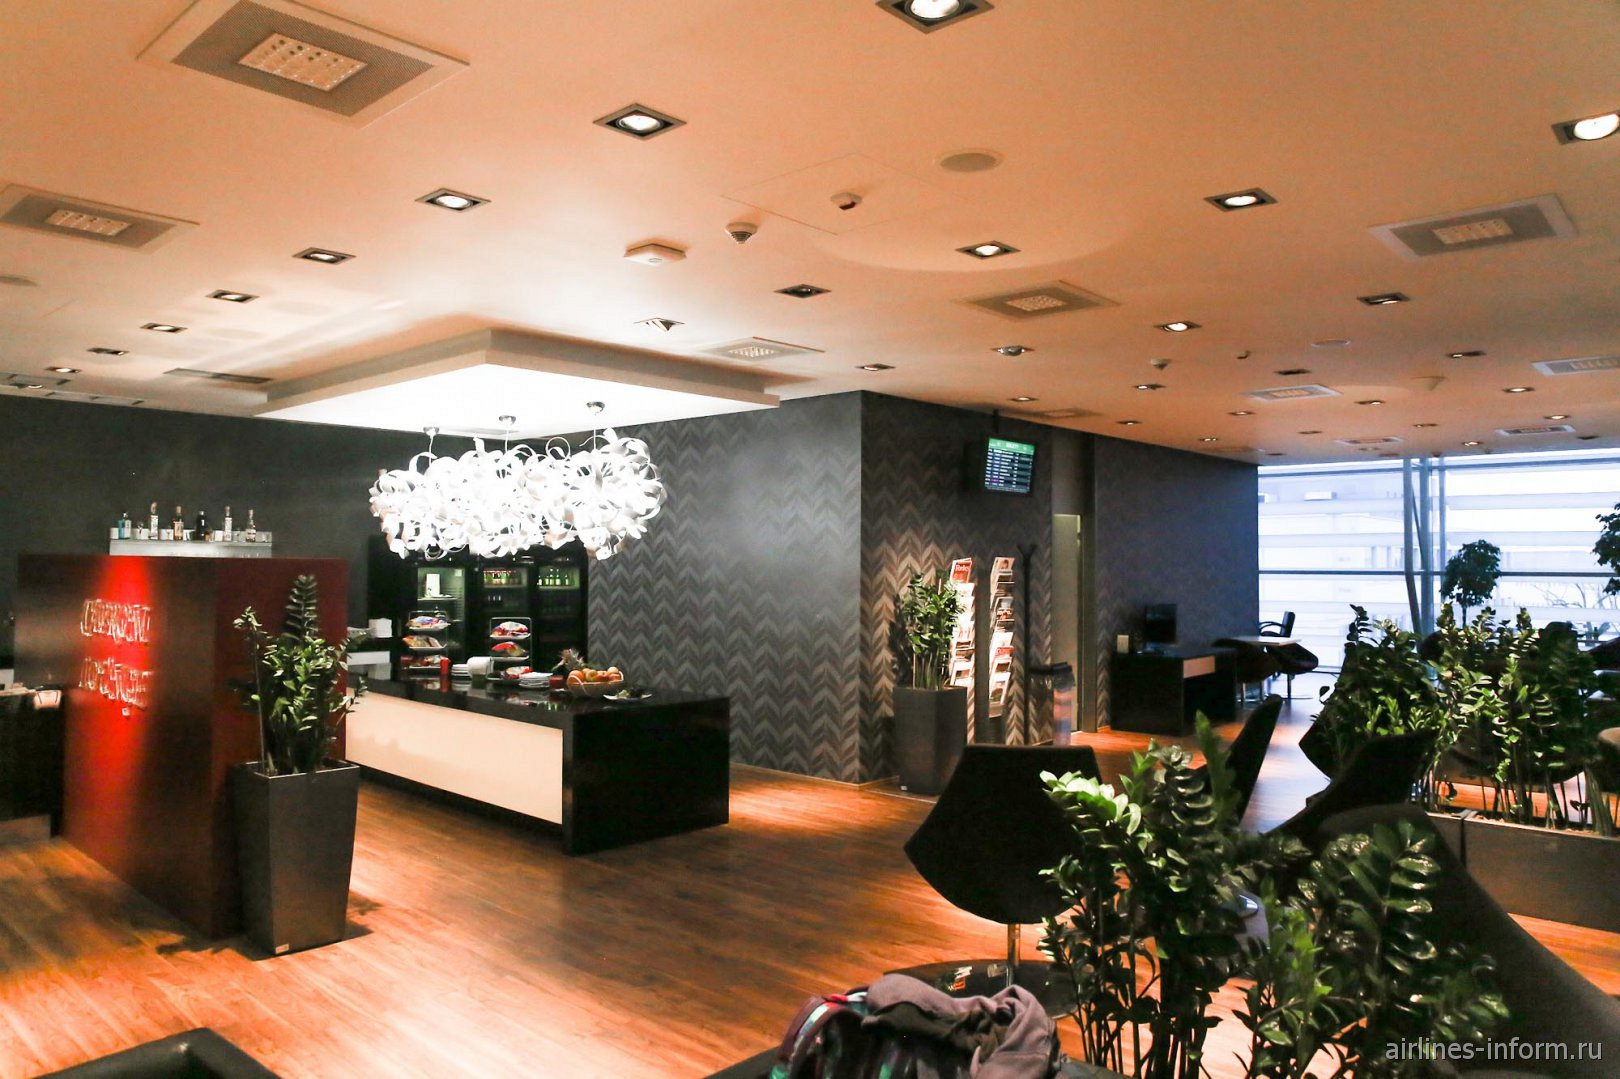 Бизнес-зал Caproni в аэропорту Братиславы